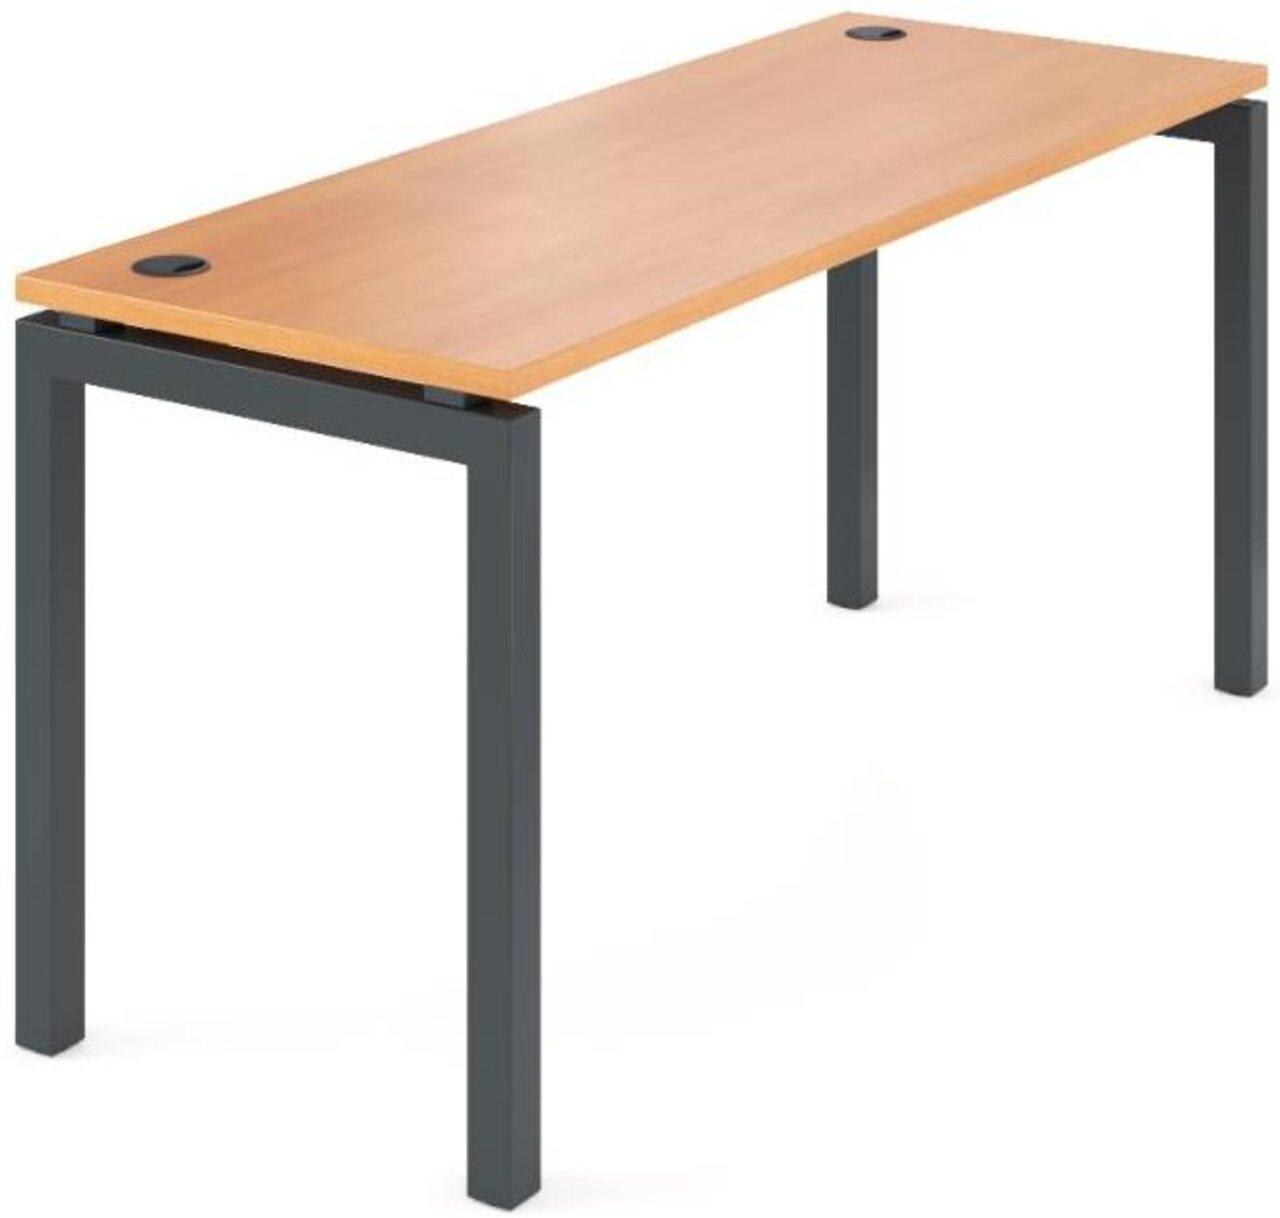 Стол на металлокаркасе  Арго 160x60x76 - фото 2